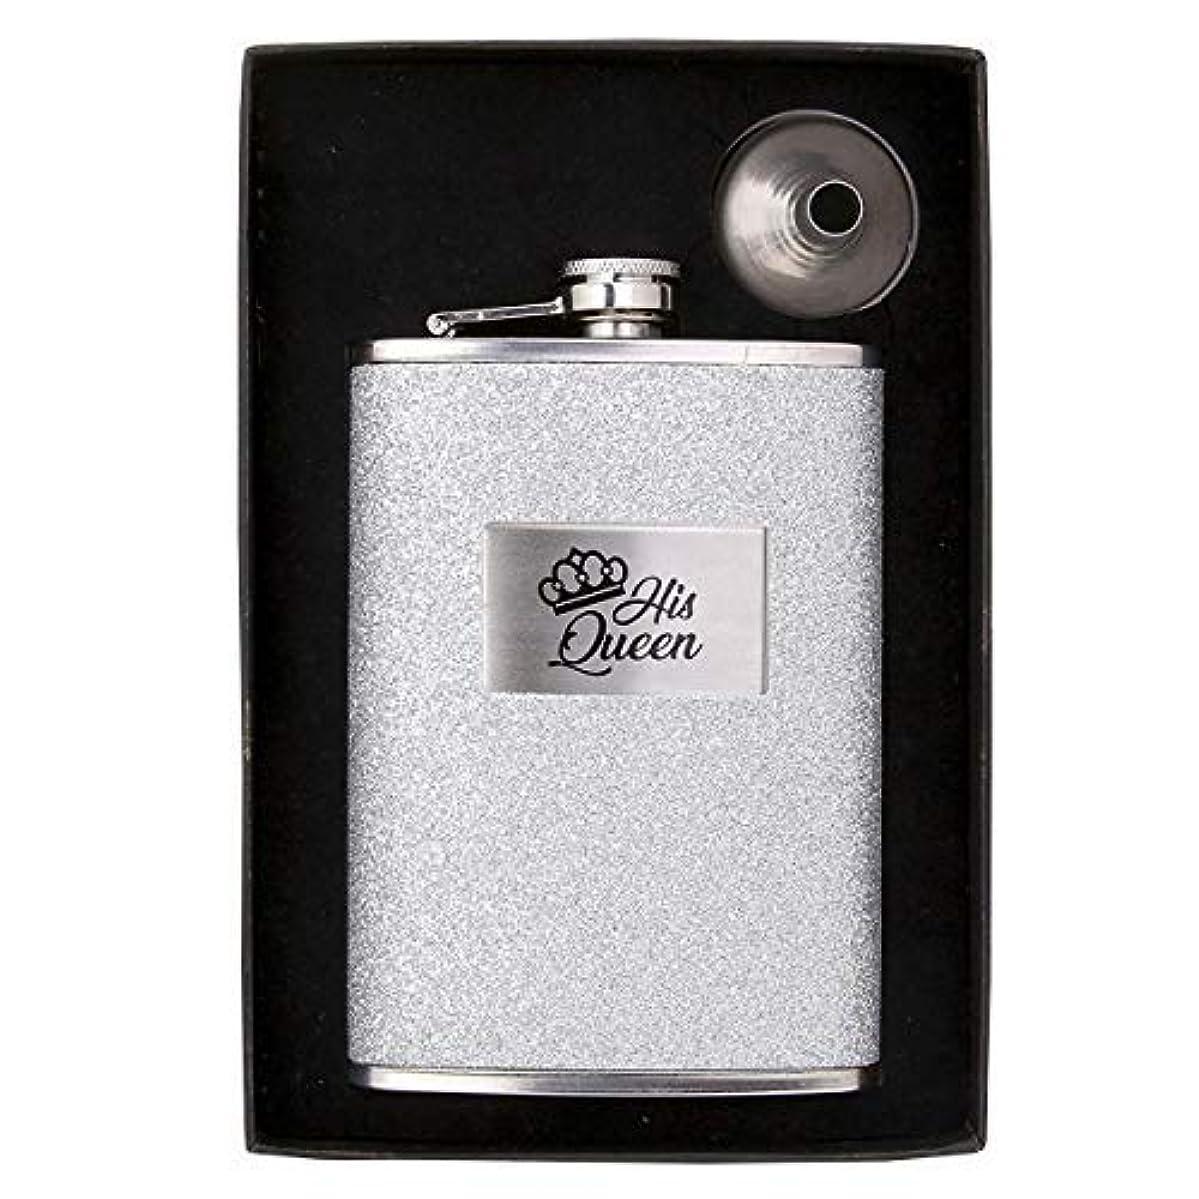 Vastigo 8 oz Food Grade Stainless Steel Flask w/Glitter Wrap